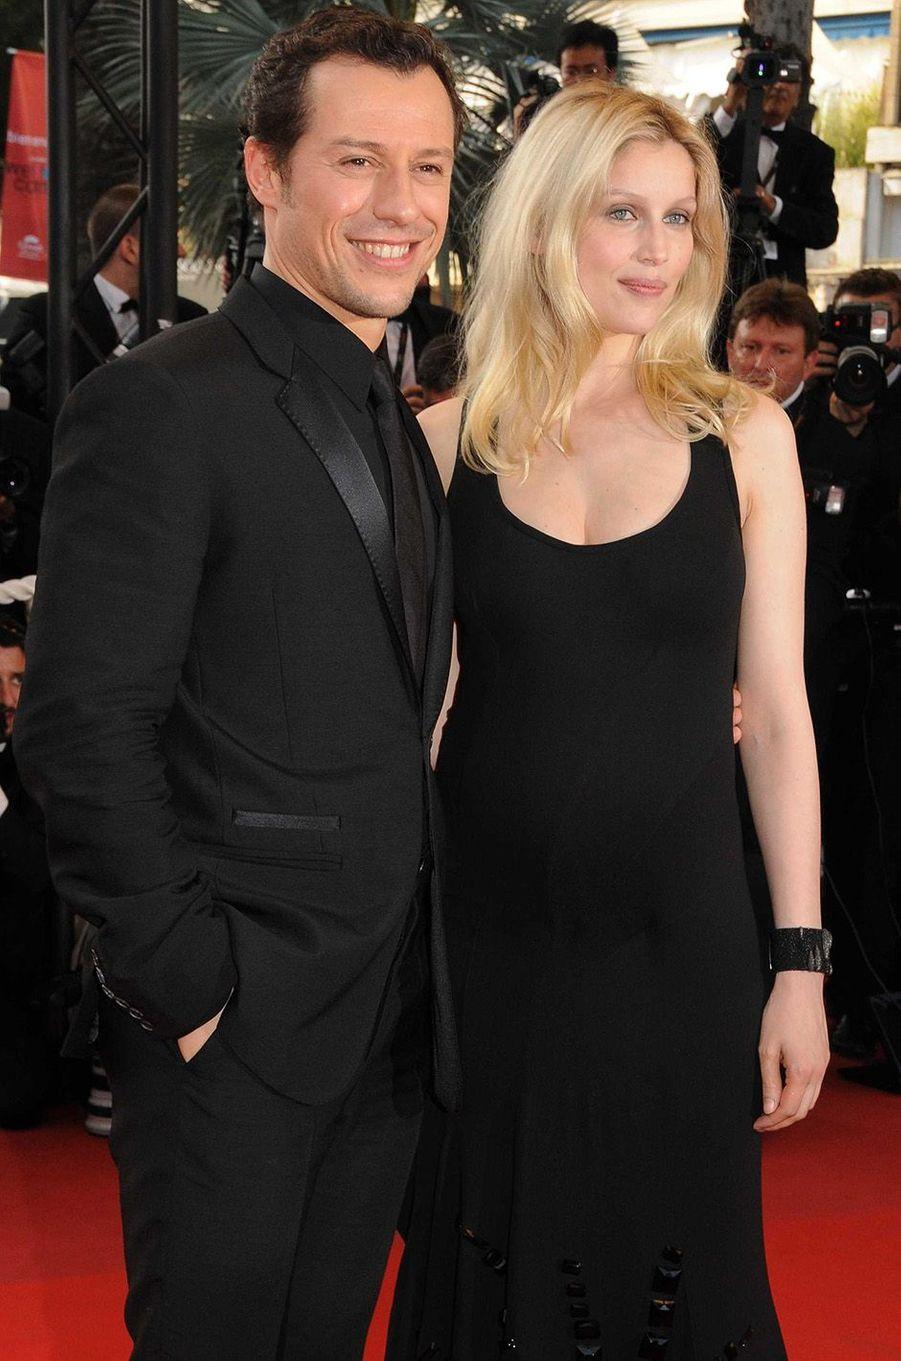 Laetitia Casta et Stefano Accorsi au festival de Cannes 2009.